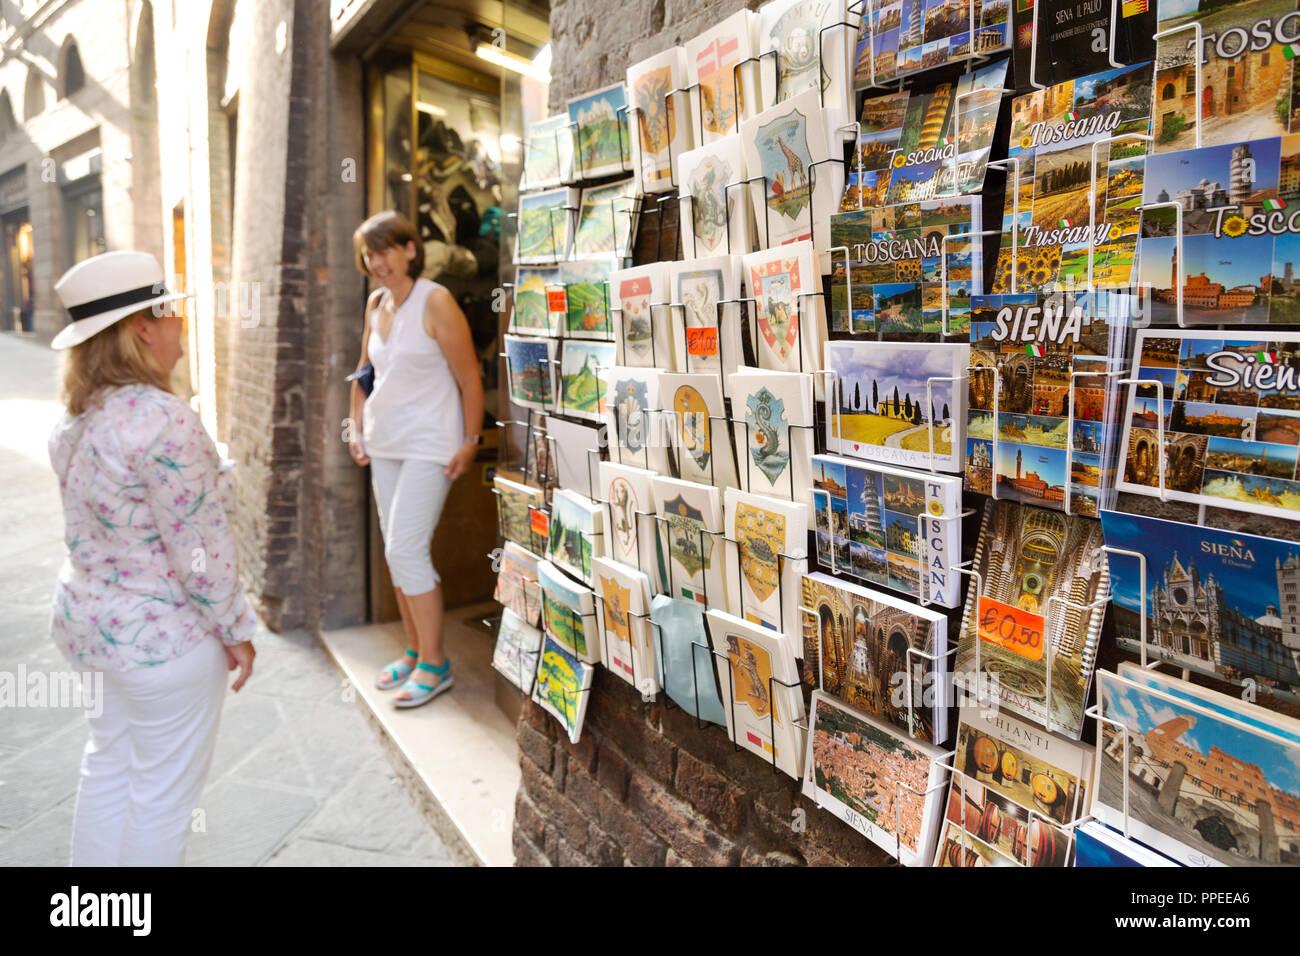 Tourists buying postcards on holiday, Siena, Tuscany, Italy Europe - Stock Image